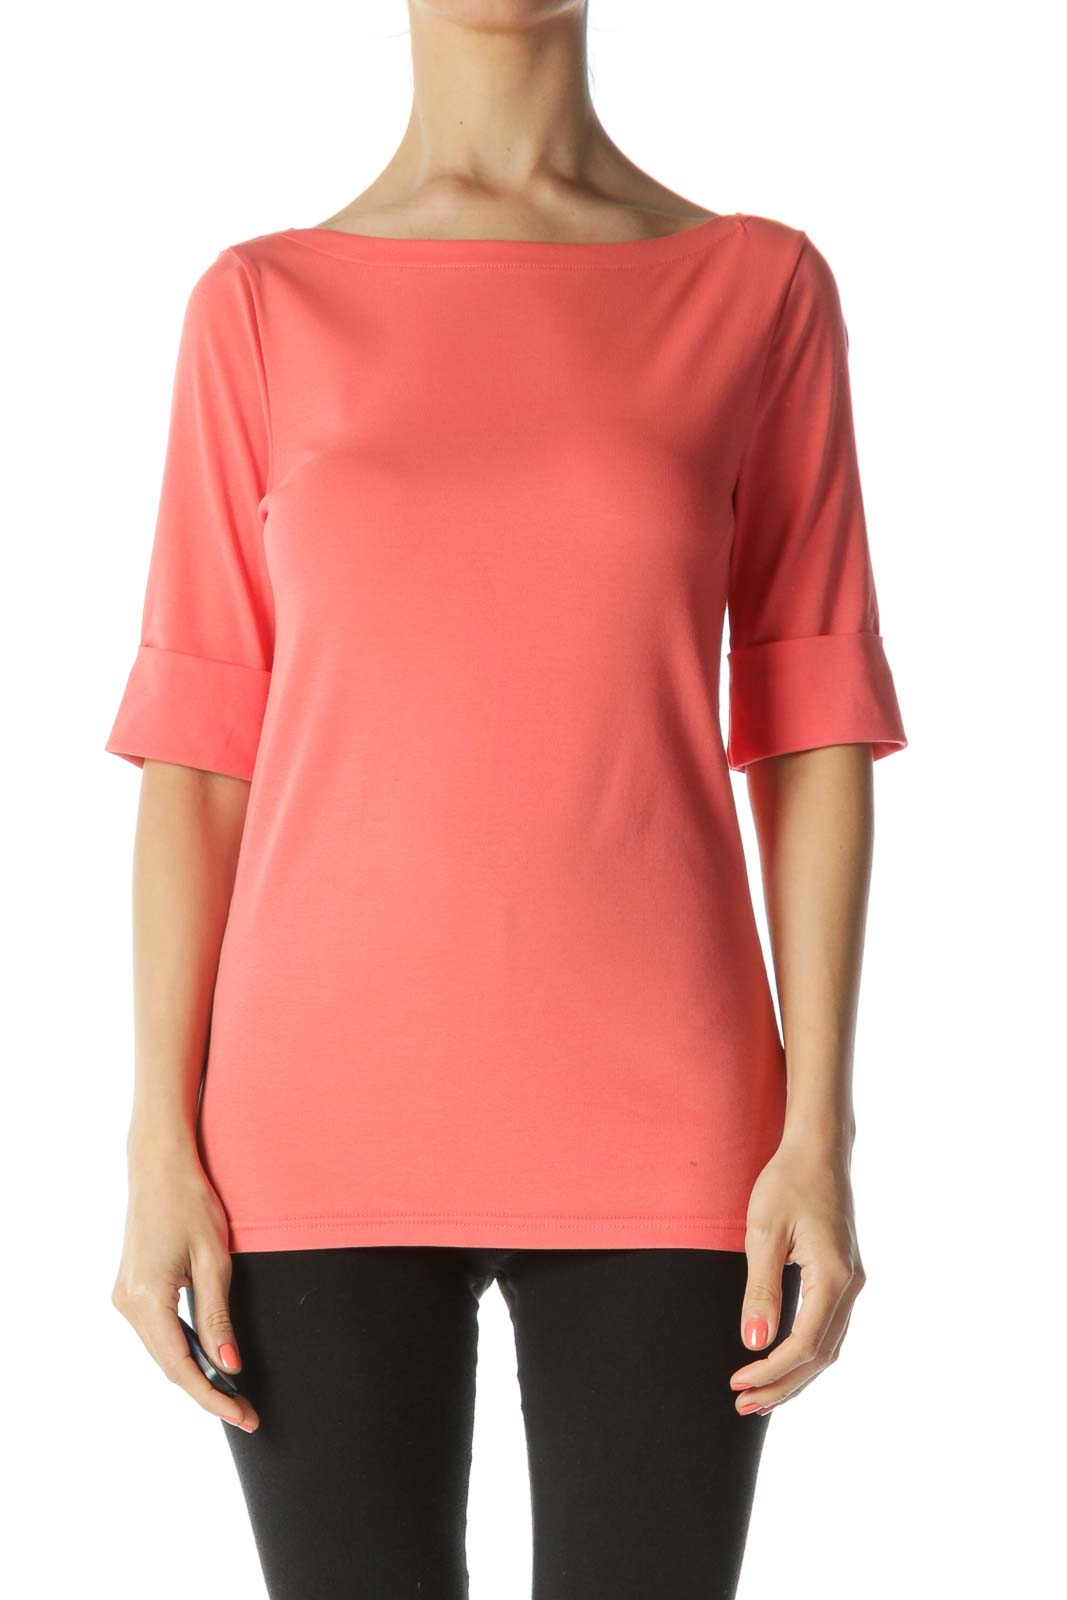 Orange Round Neck Knitted Shirt